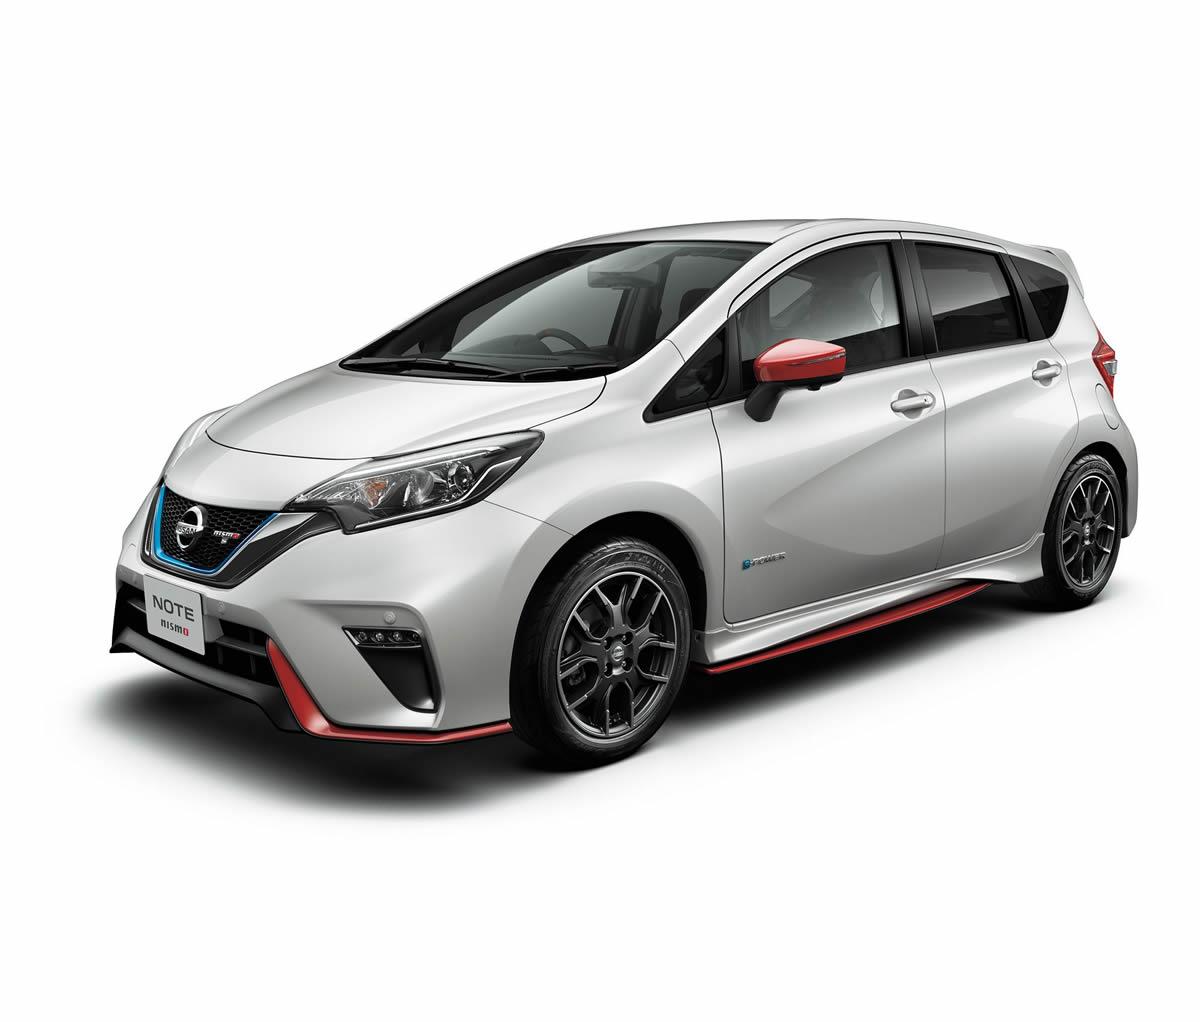 2019 Nissan Note e-Power Nismo S Özellikleri